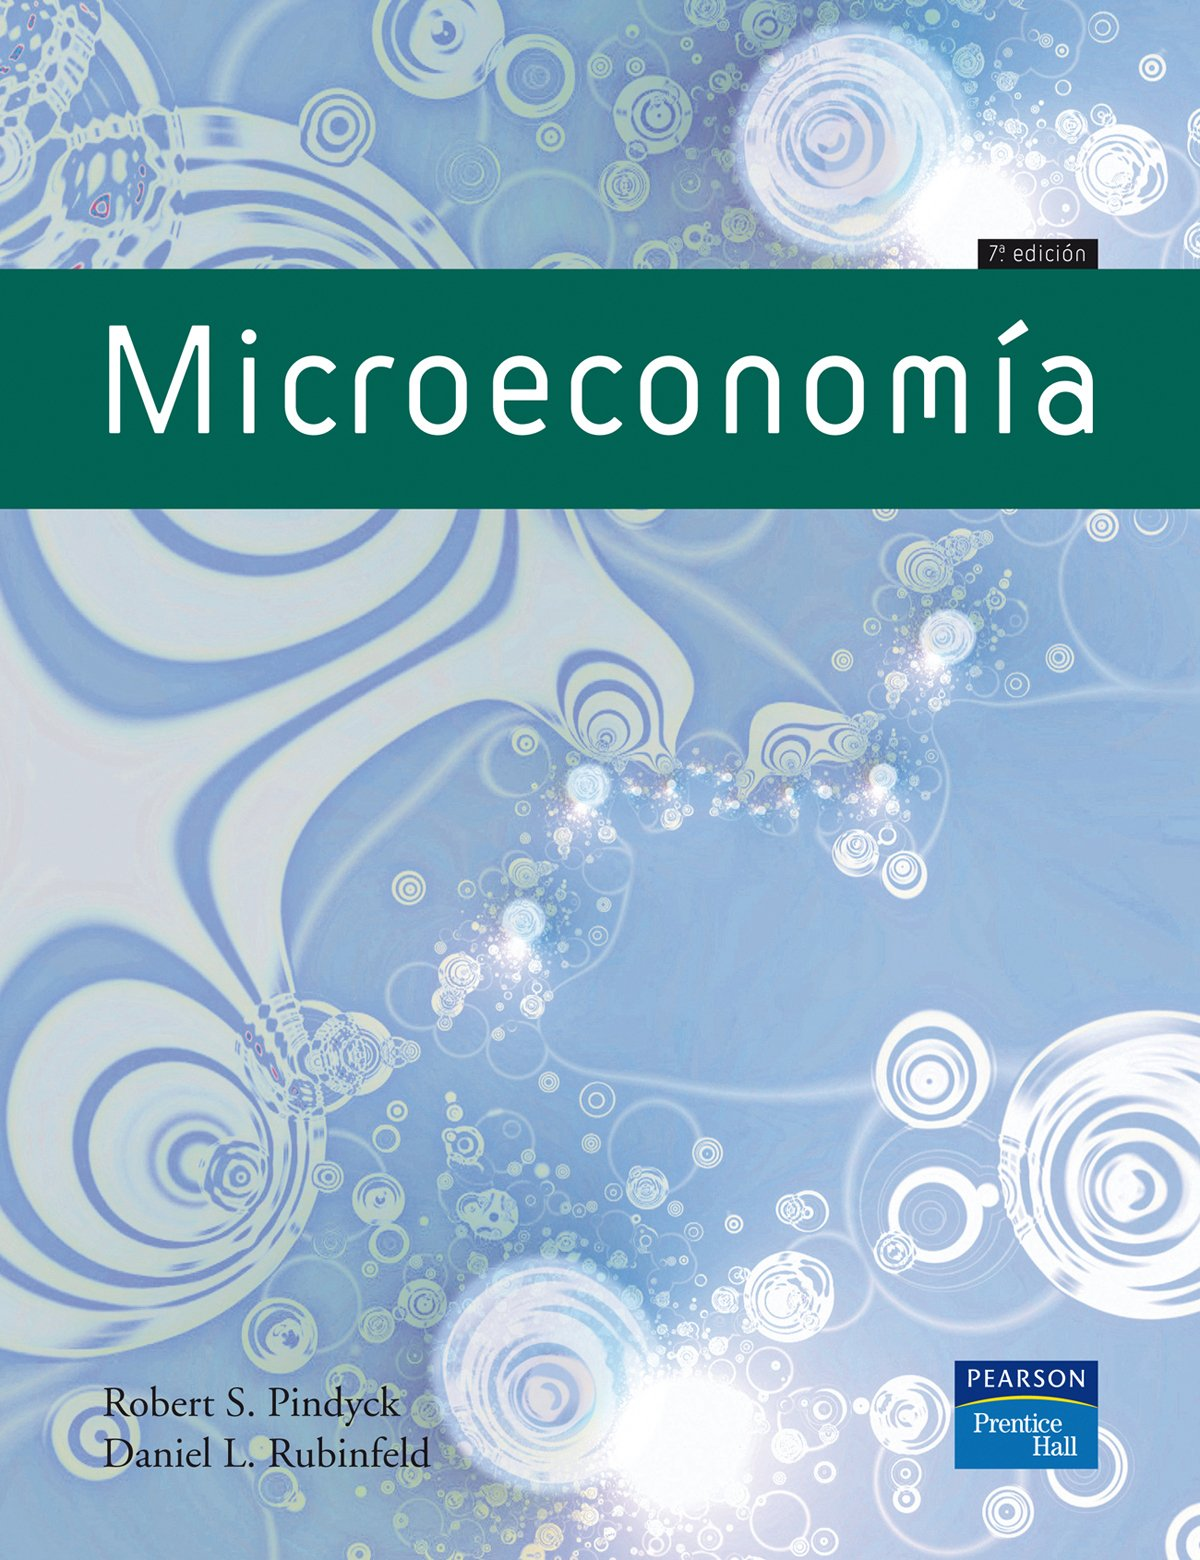 microeconomia de pindyck